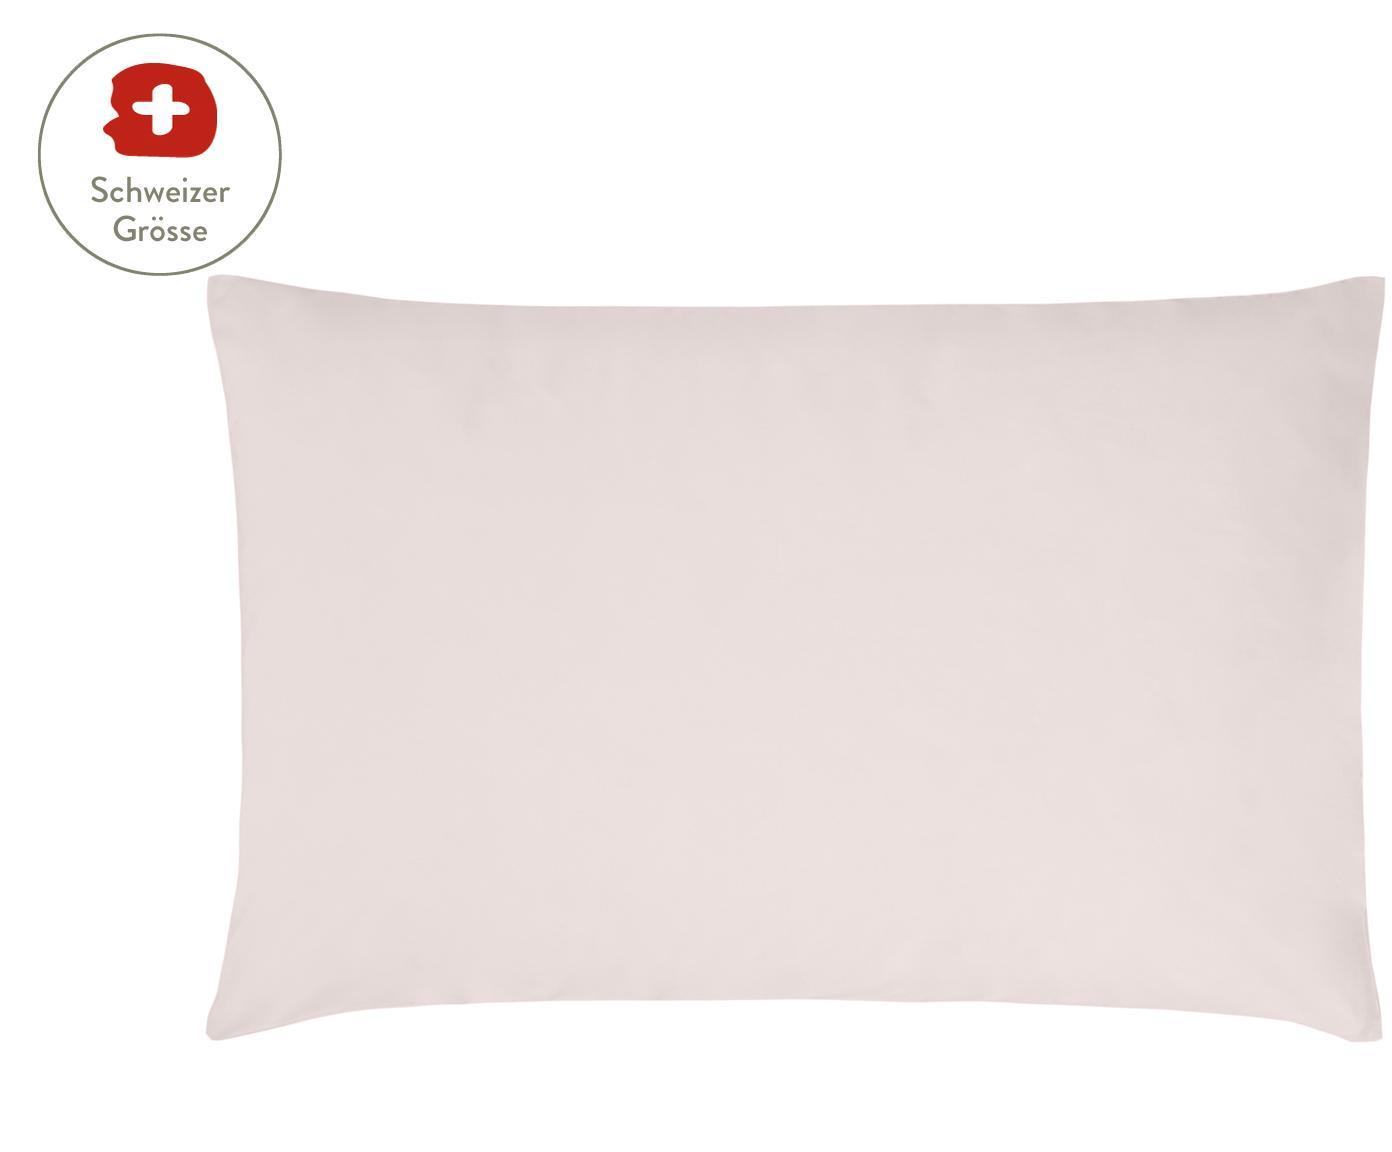 Baumwollperkal-Kissenbezug Elsie in Rosa, Webart: Perkal Fadendichte 200 TC, Rosa, 65 x 100 cm